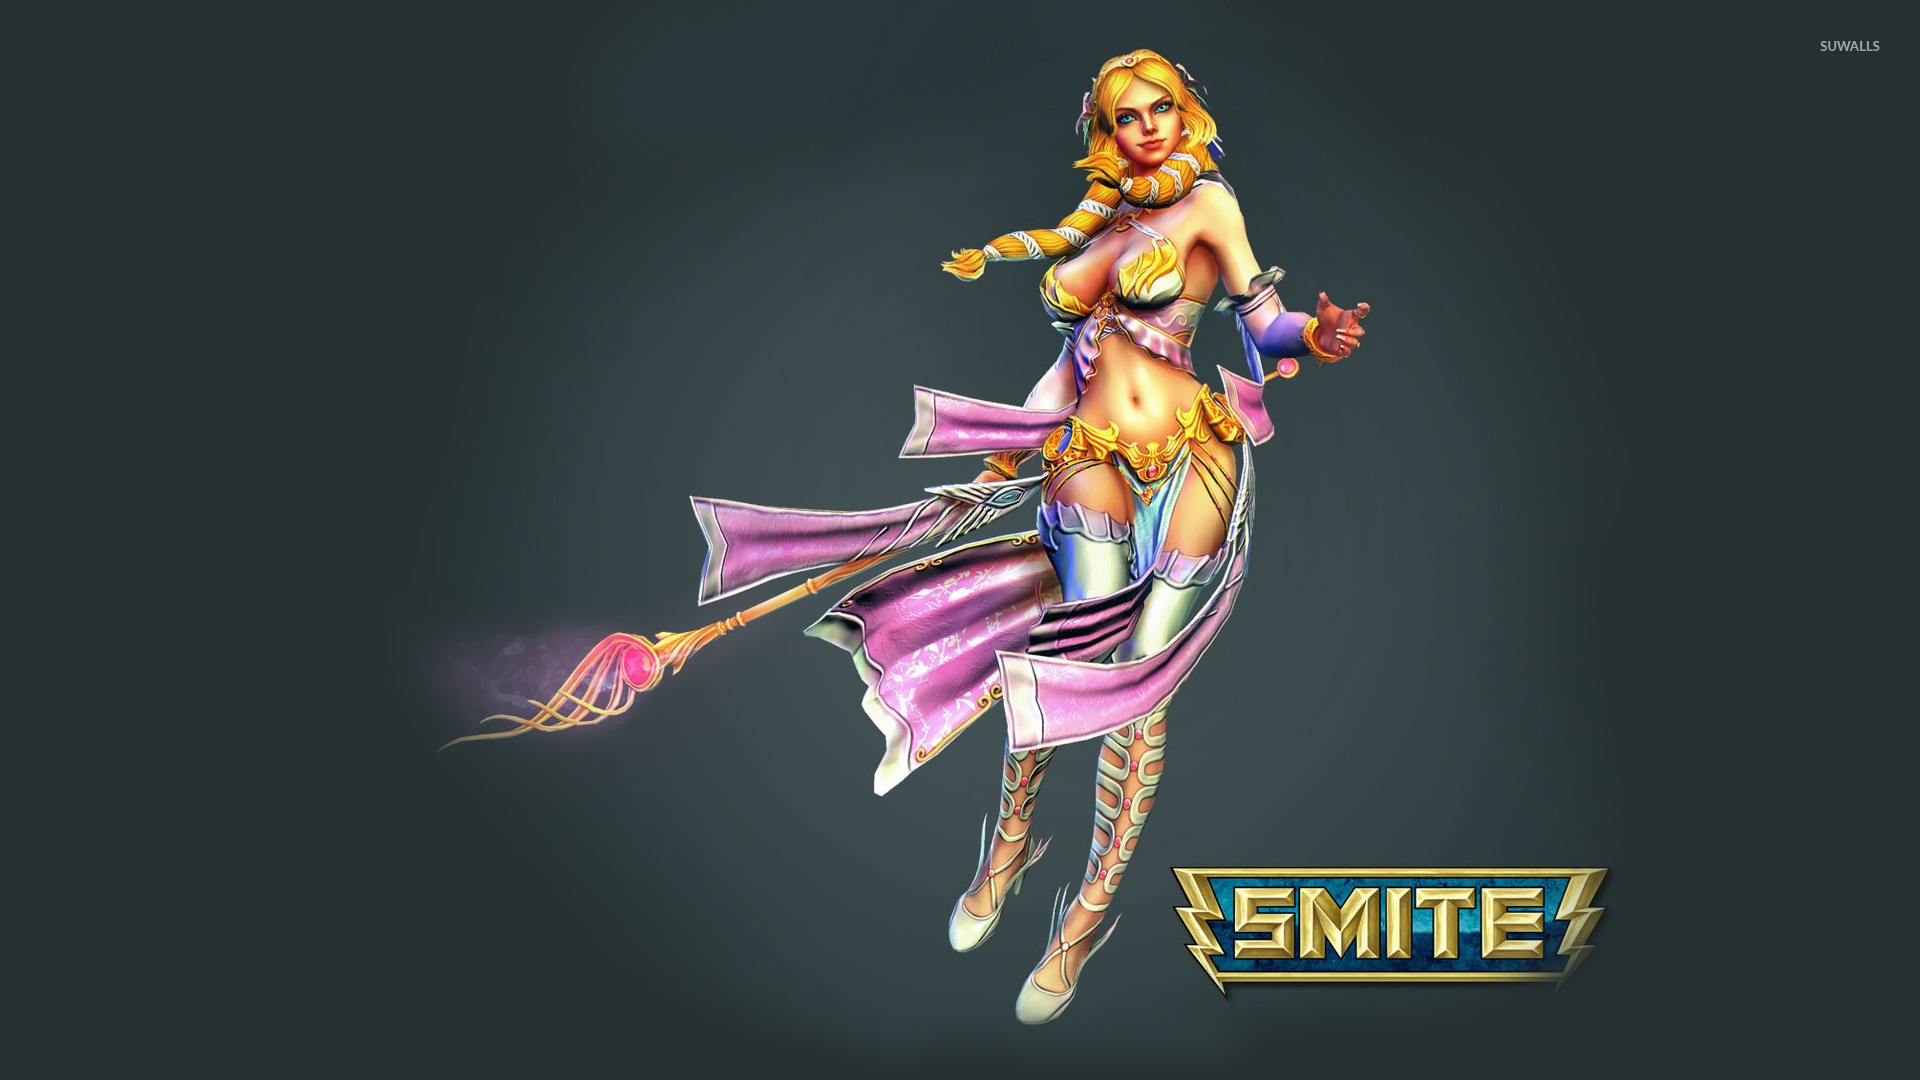 Smite Logo Wallpaper